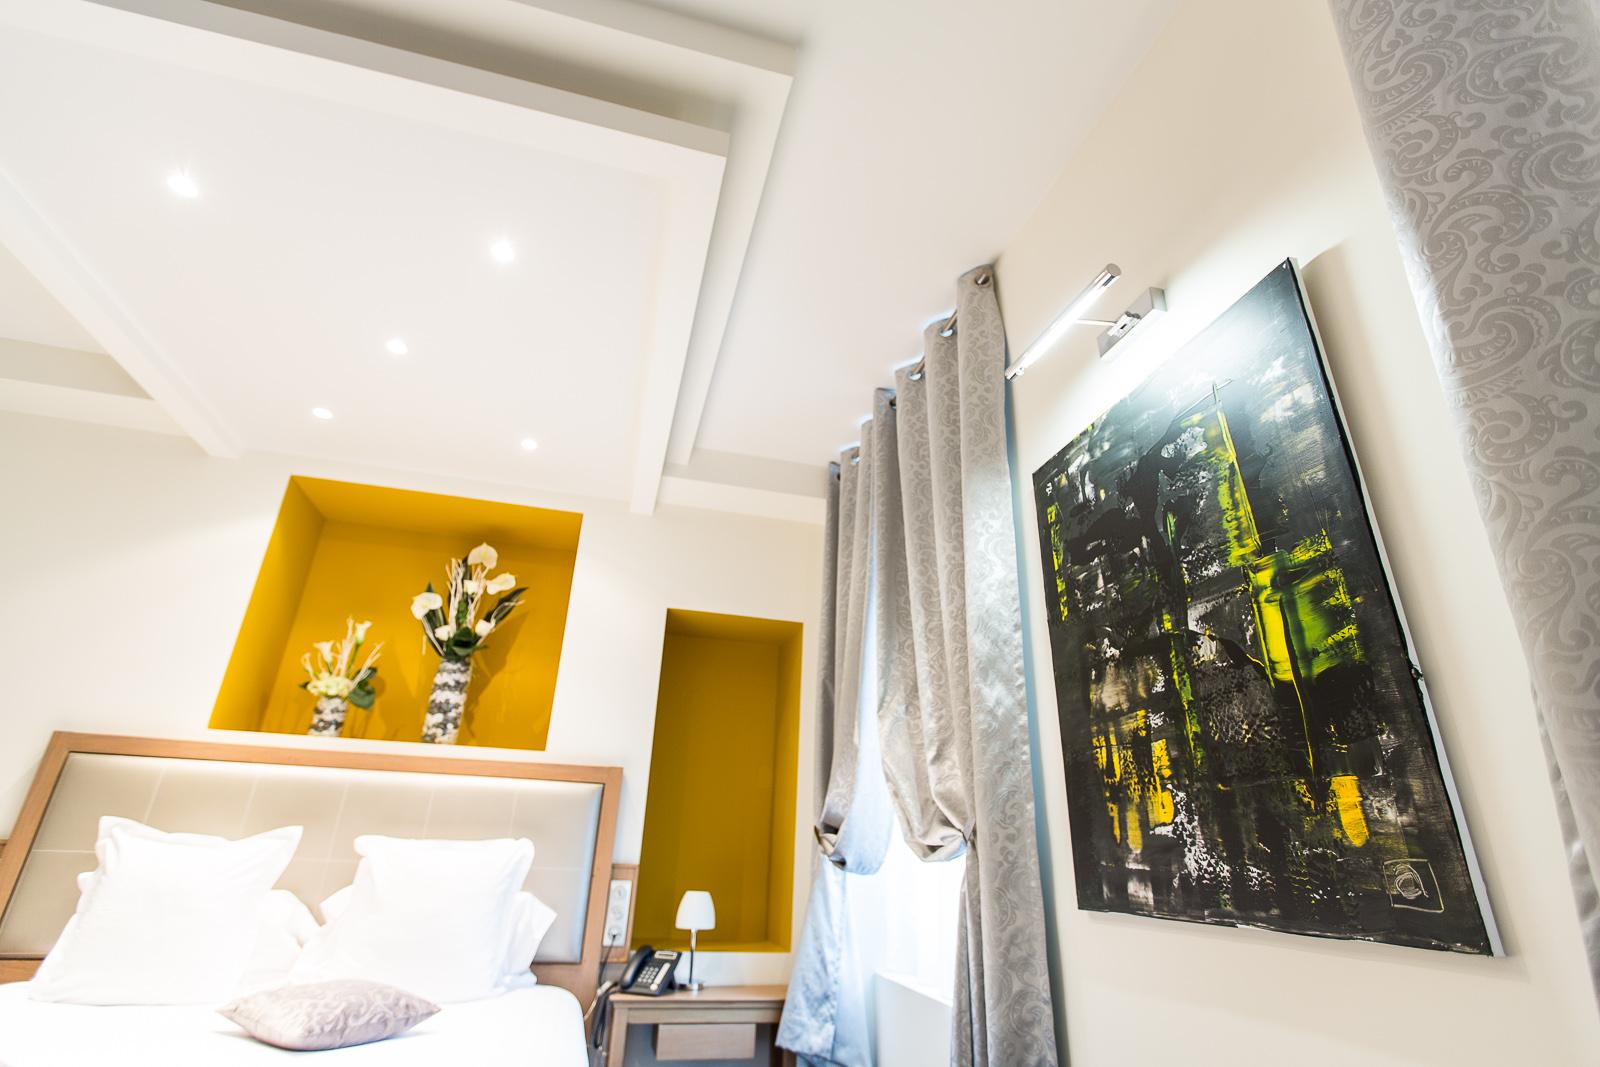 Hôtel Marotte chambre cosy tableau